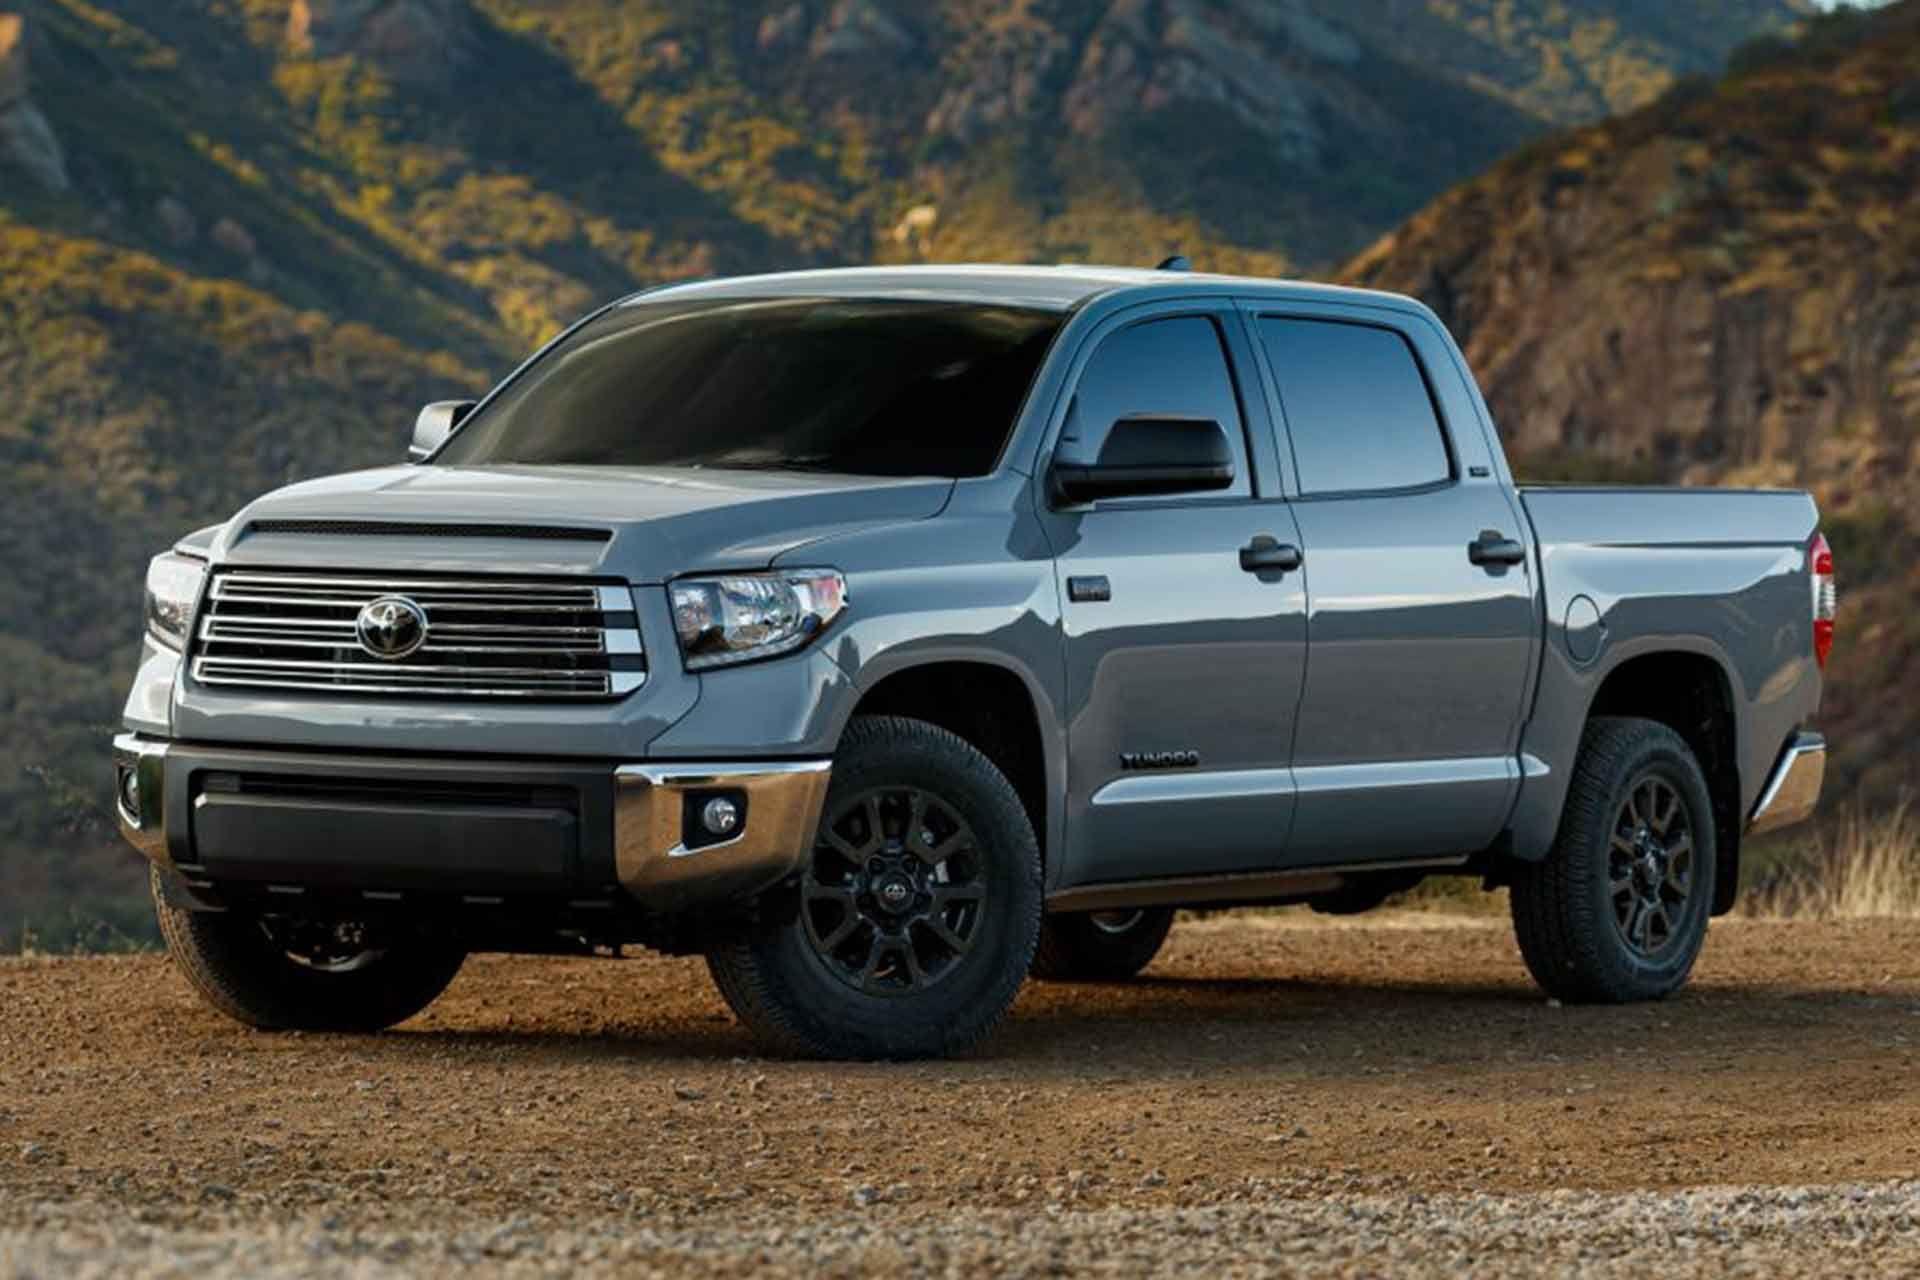 Toyota Trail Edition Trucks Suvs In 2021 New Toyota Tundra Toyota Tundra Toyota Suv